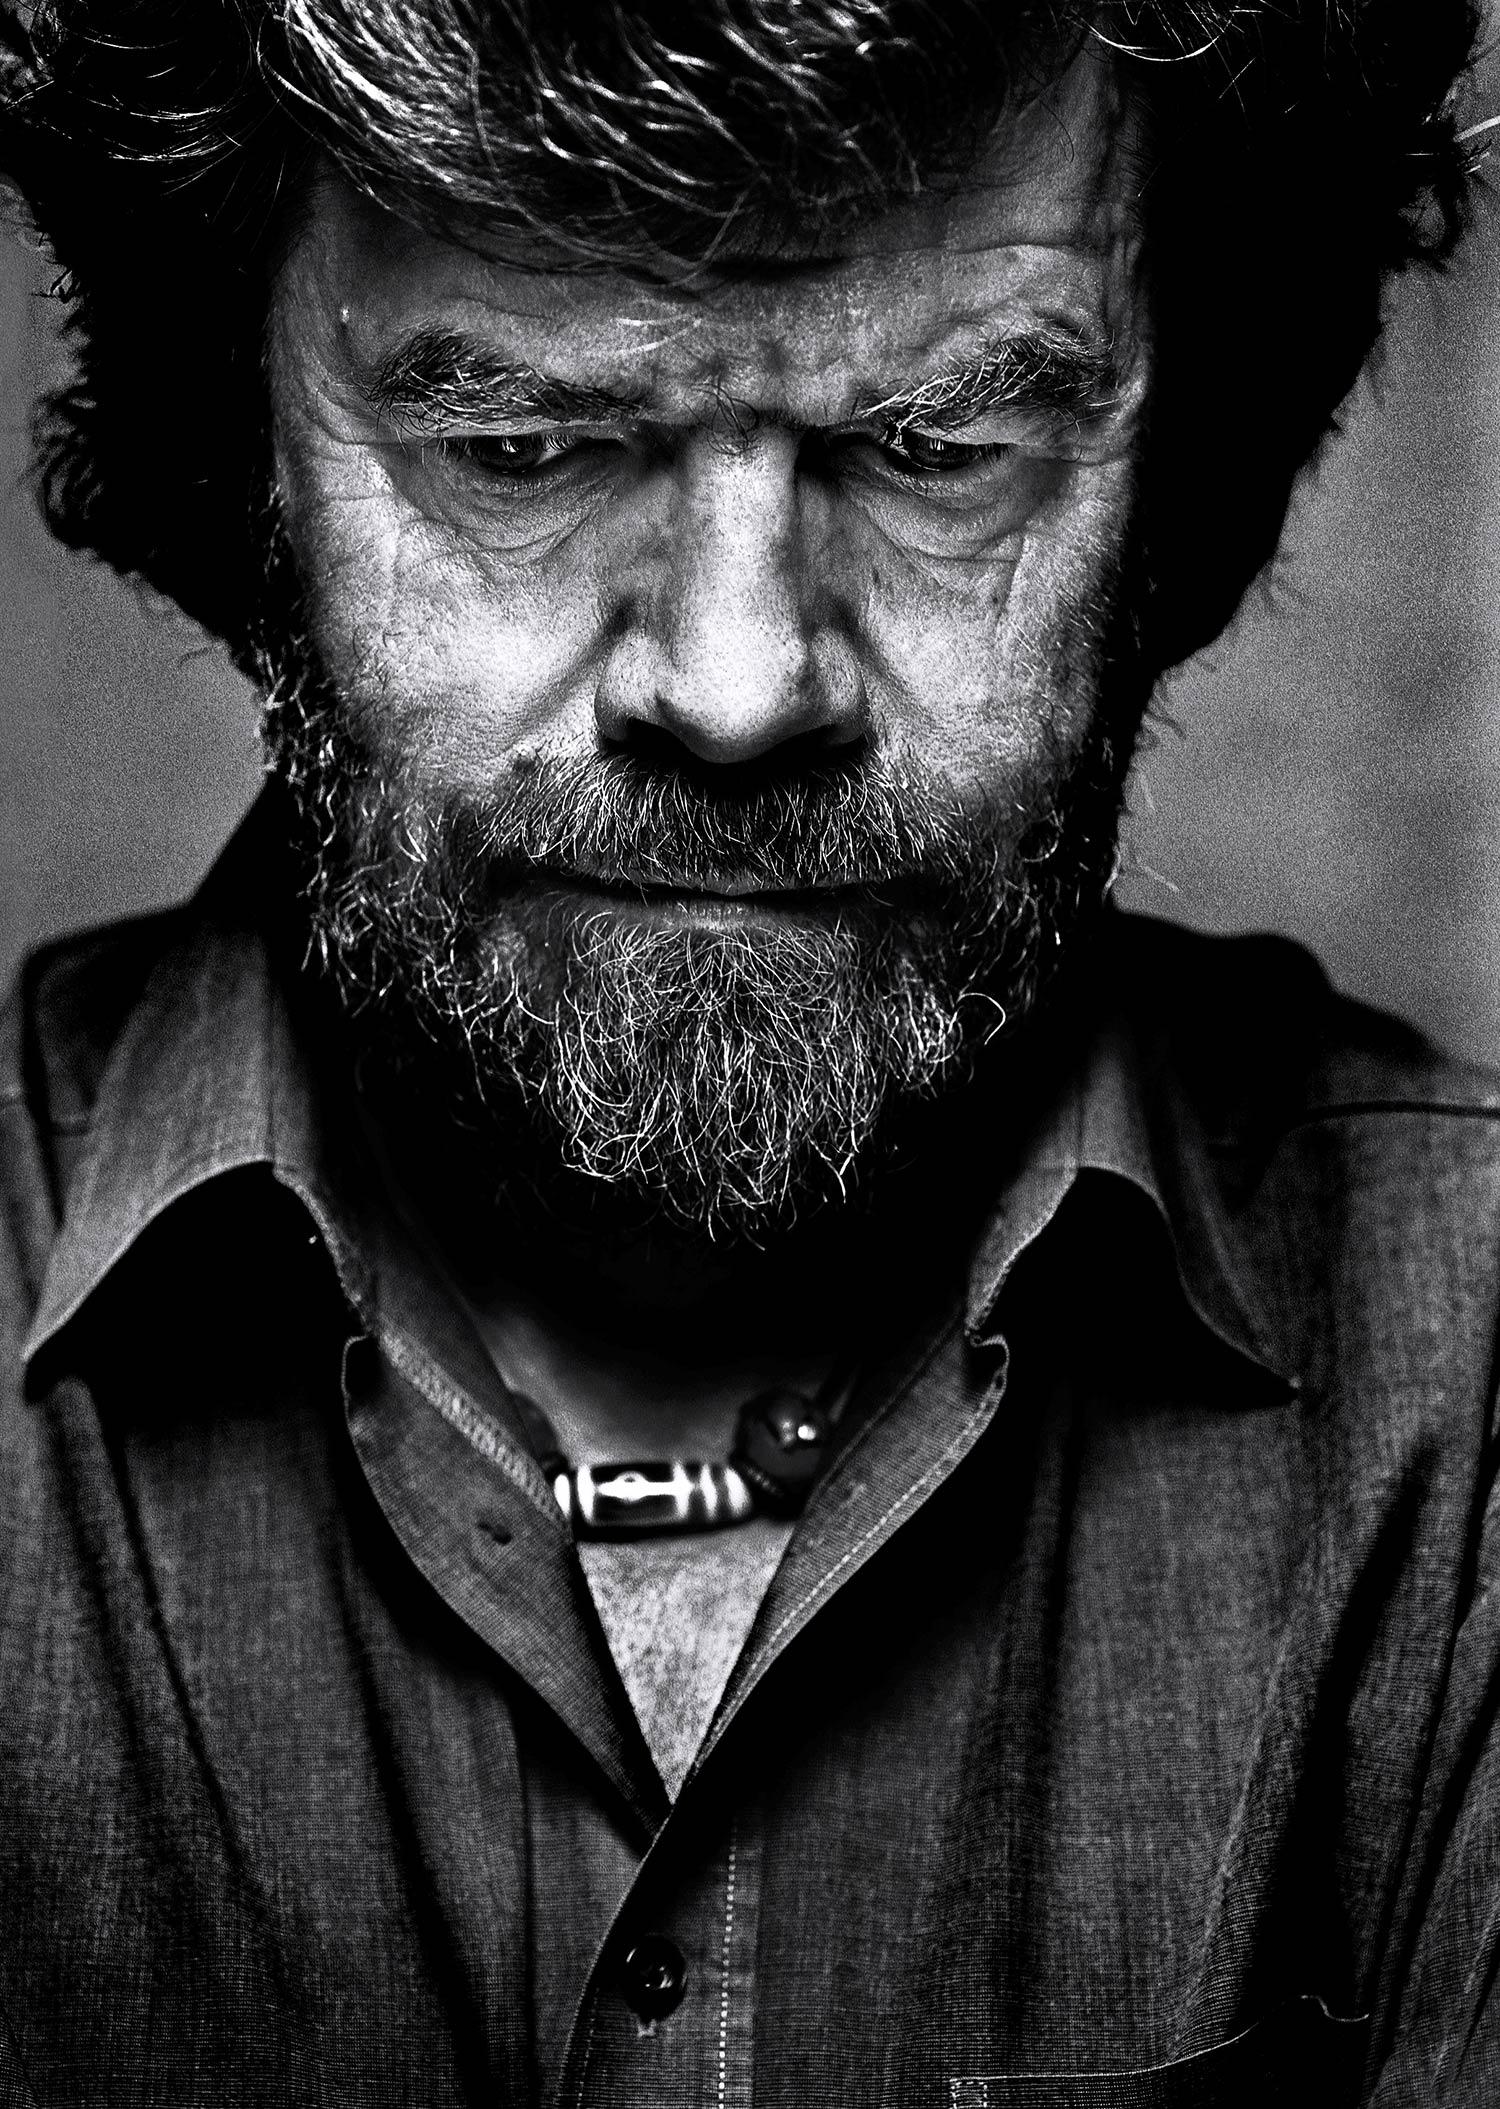 Der Gipfelstürmer Grenzgänger und Bergsteiger-Ikone Reinhold Messner live in Regensburg